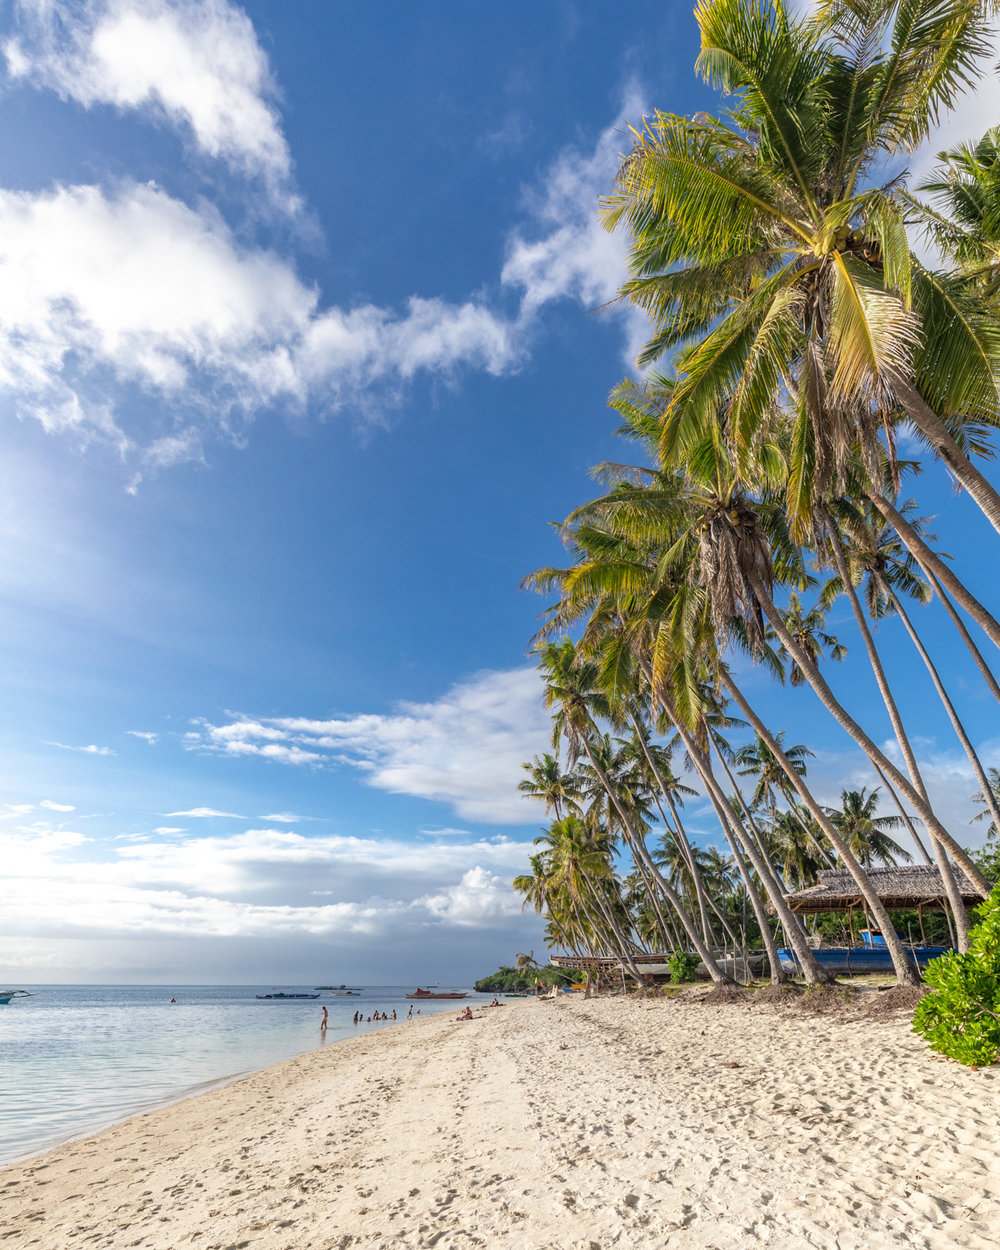 Paliton Beach on Siquijor Island, The Philippines